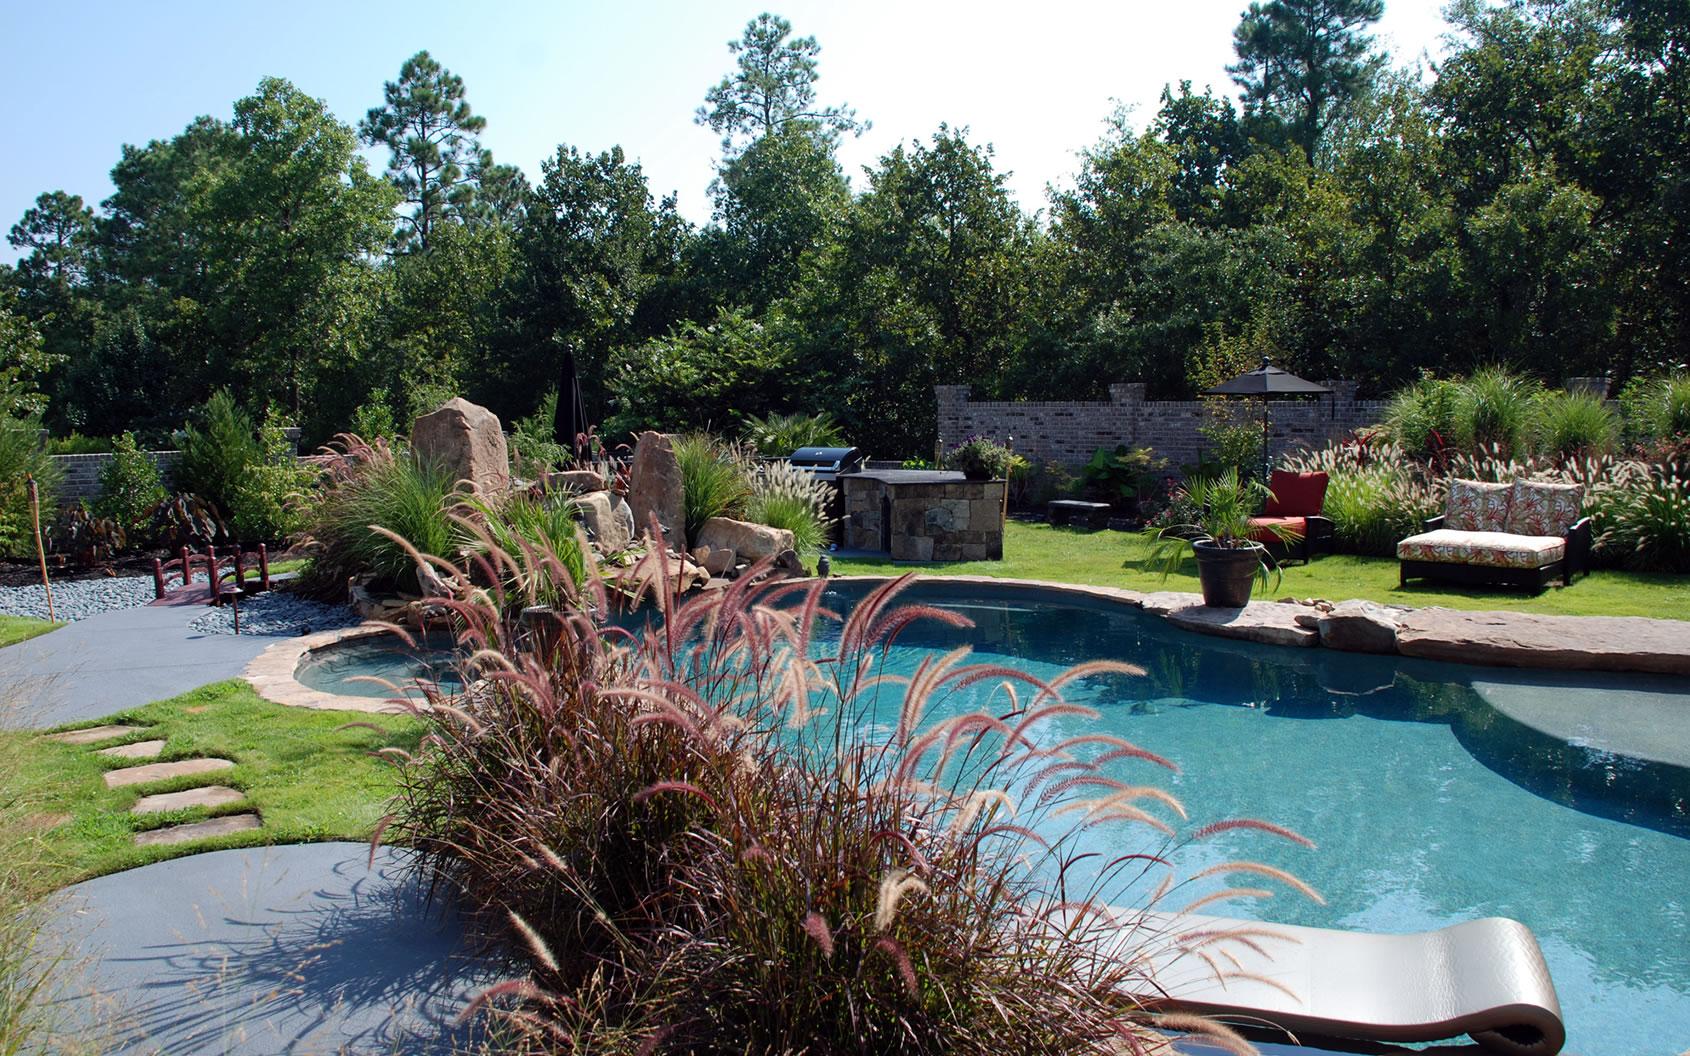 Pool Designer residential pools & spascolumbia and charleston south carolina